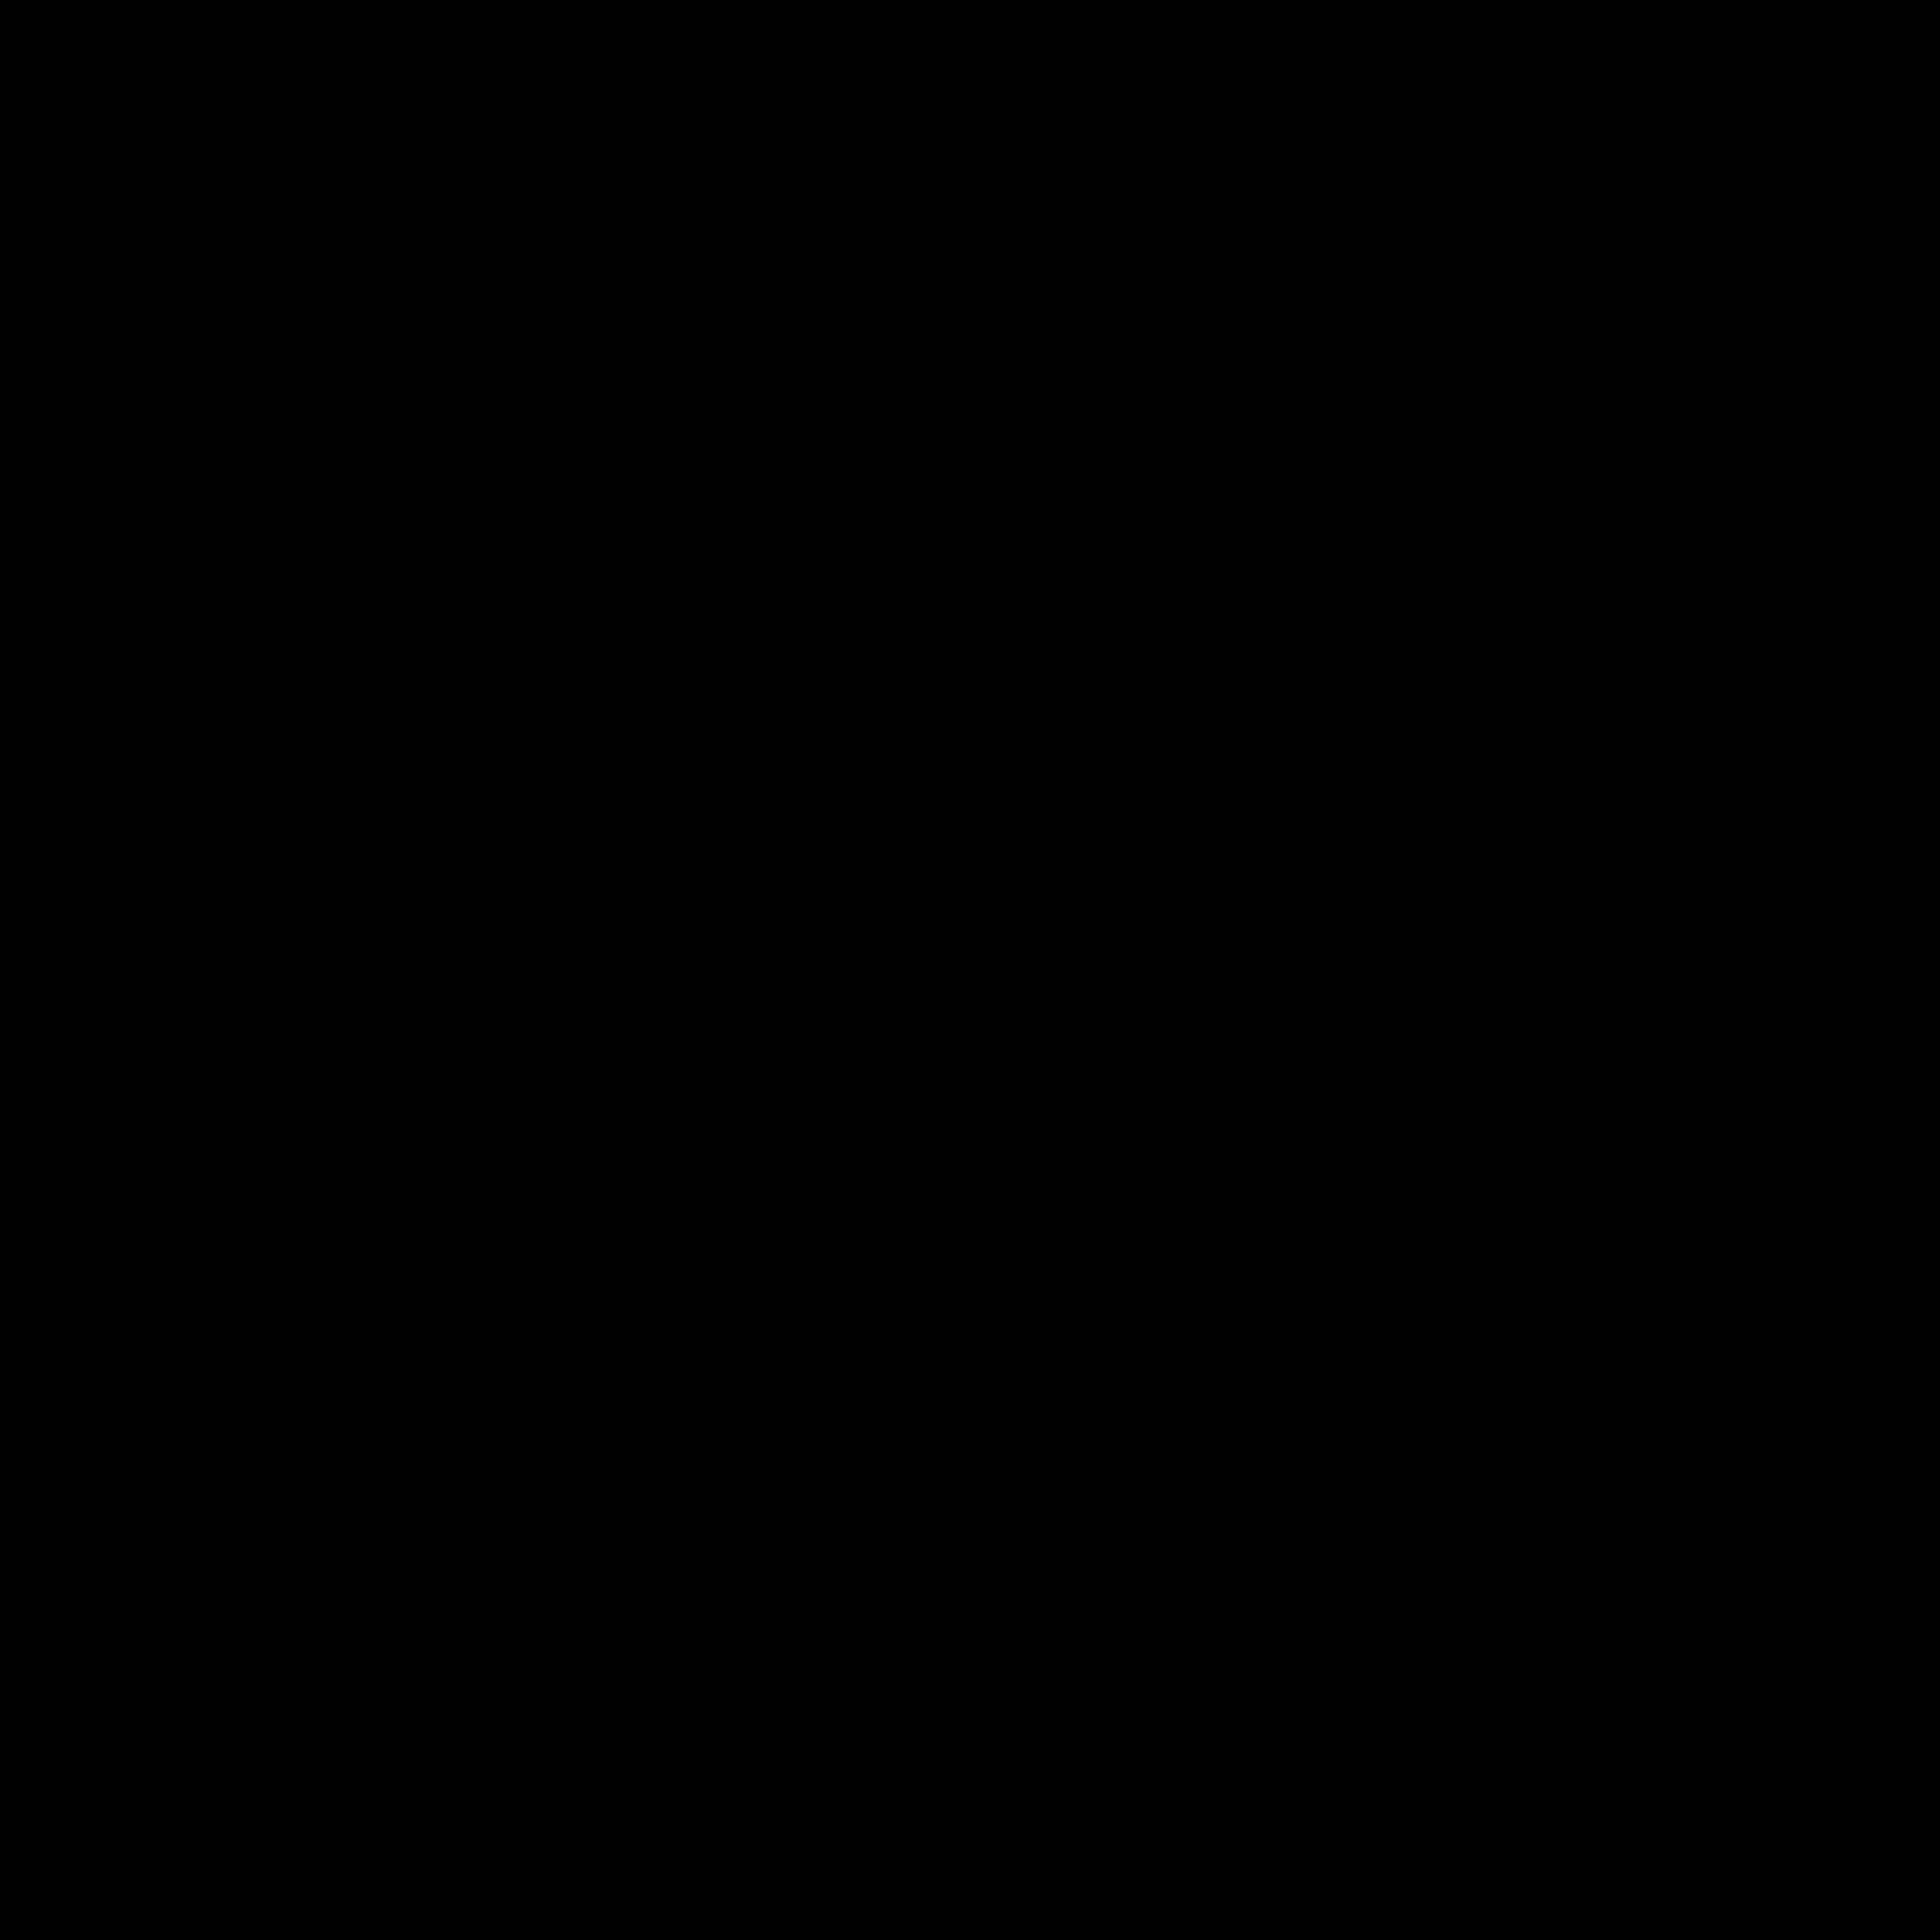 House Clipart Symbol.